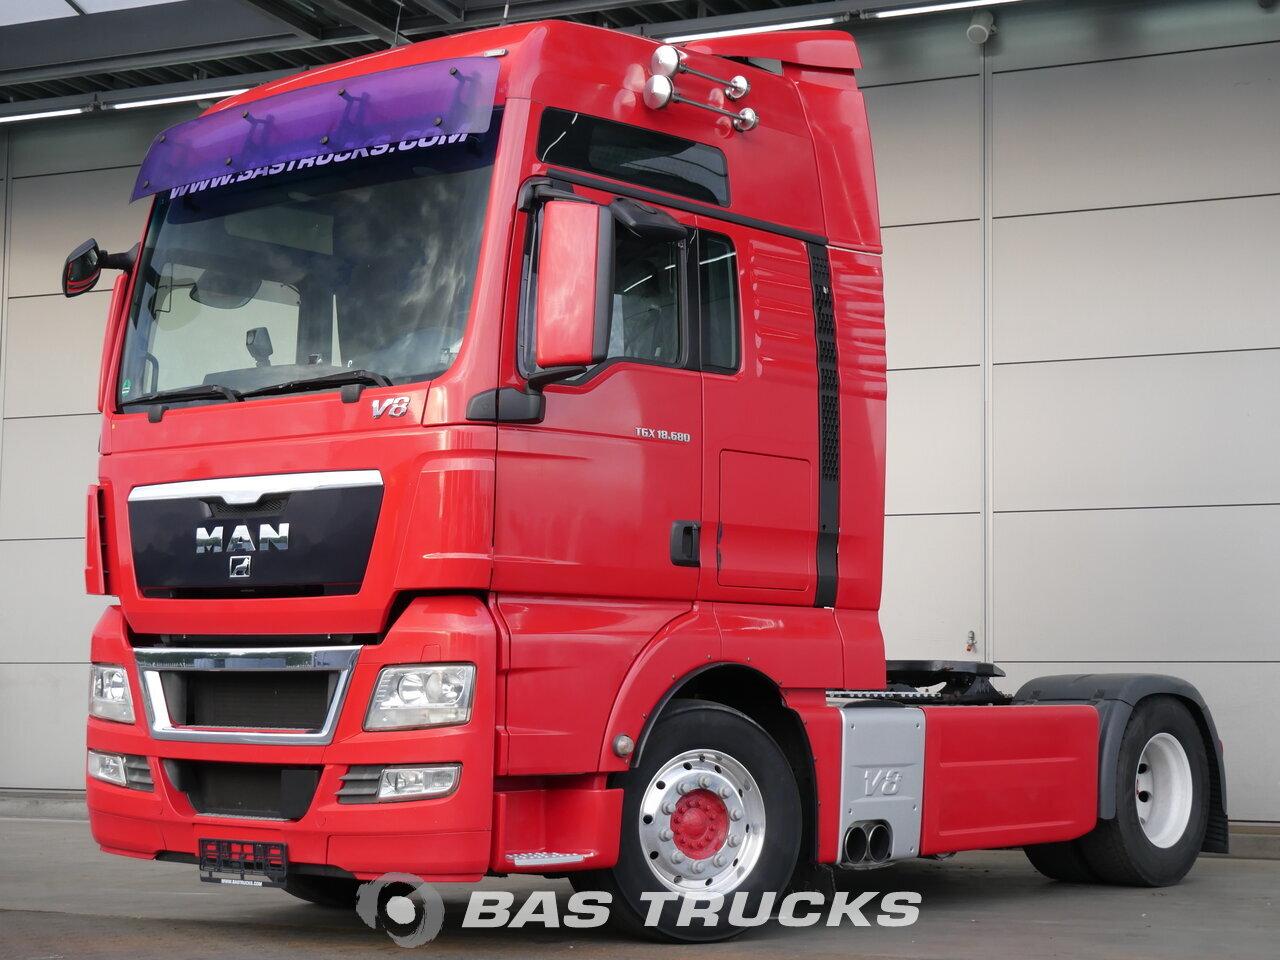 photo de Occasion Tracteur MAN TGX 18.680 XXL 4X2 2010